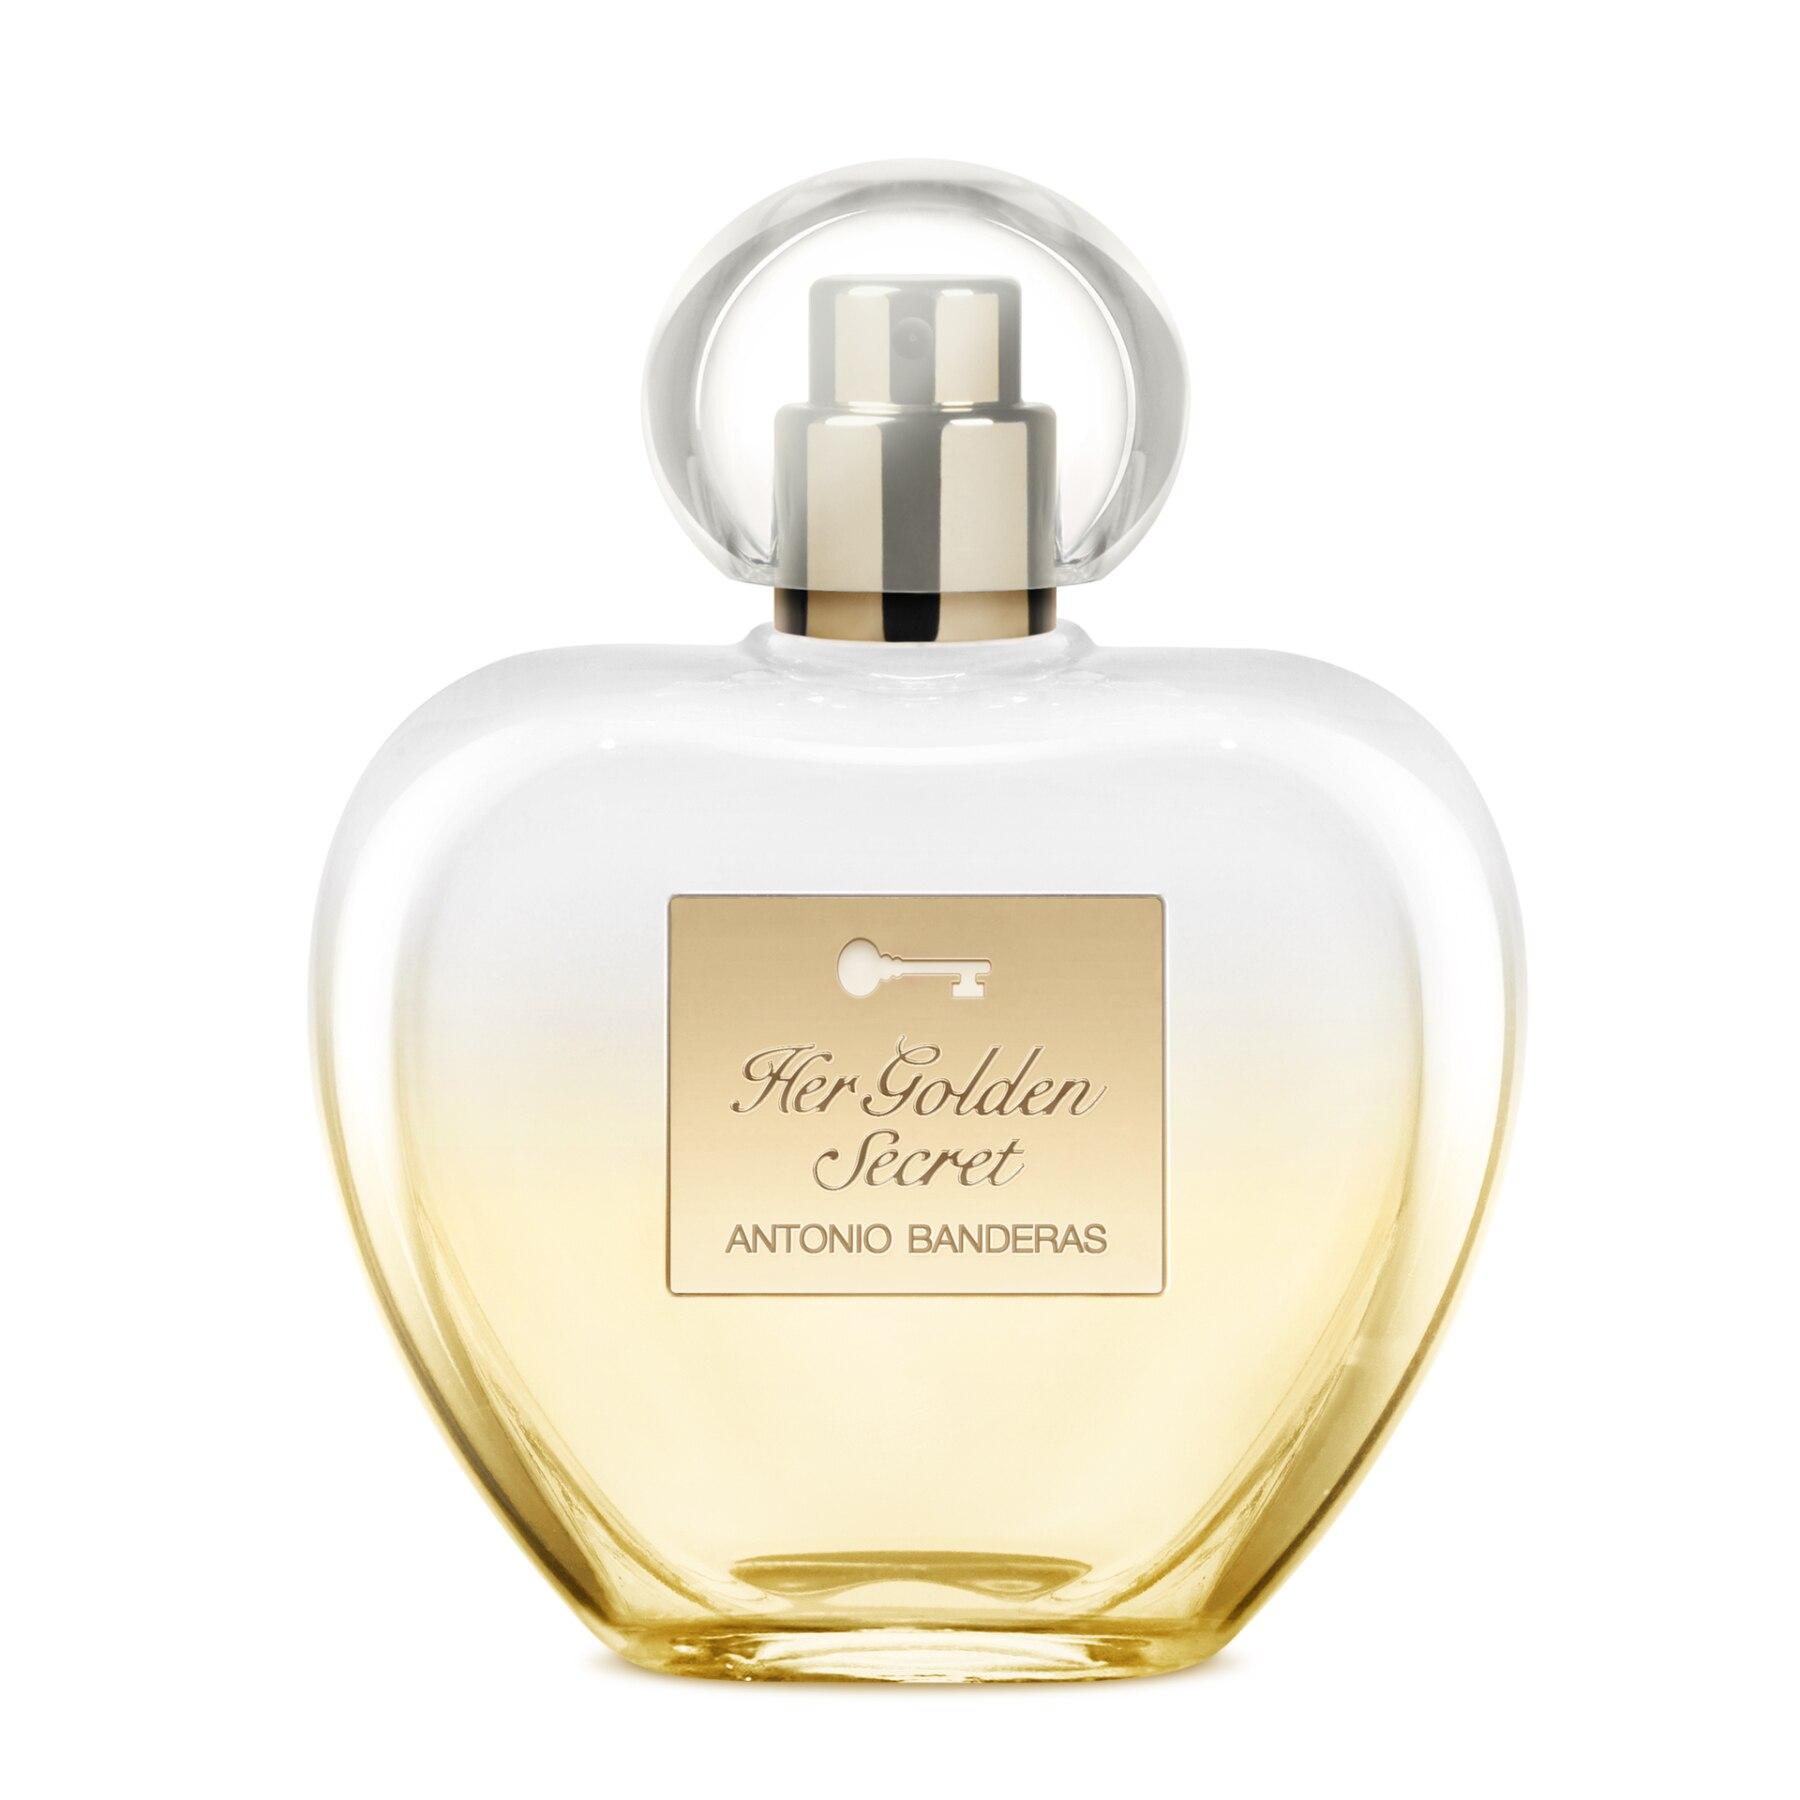 Perfume Antonio Banderas Her Golden Secret Eau De Toilette Perfume 80 Ml Repack